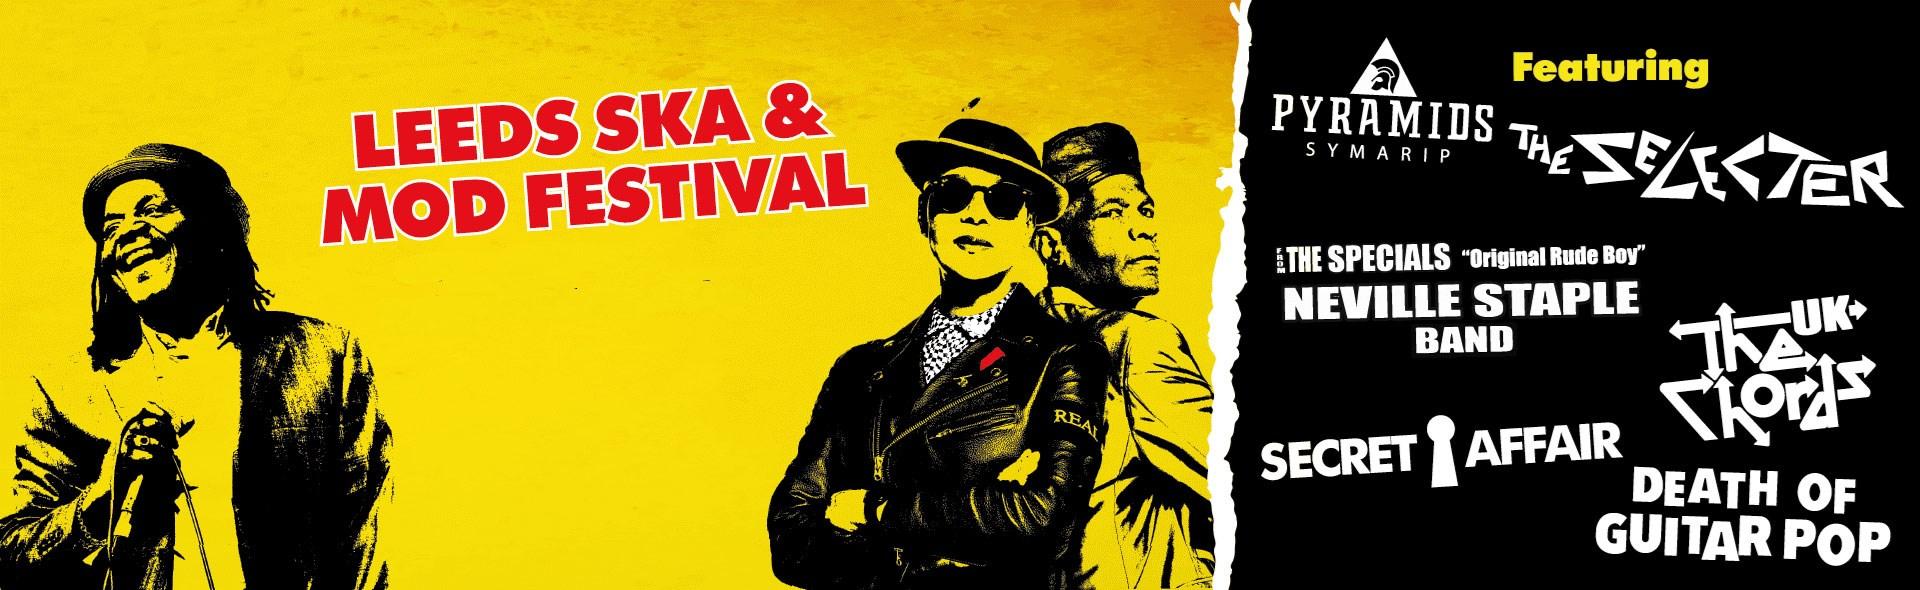 Leeds Ska & Mod Festival 2021